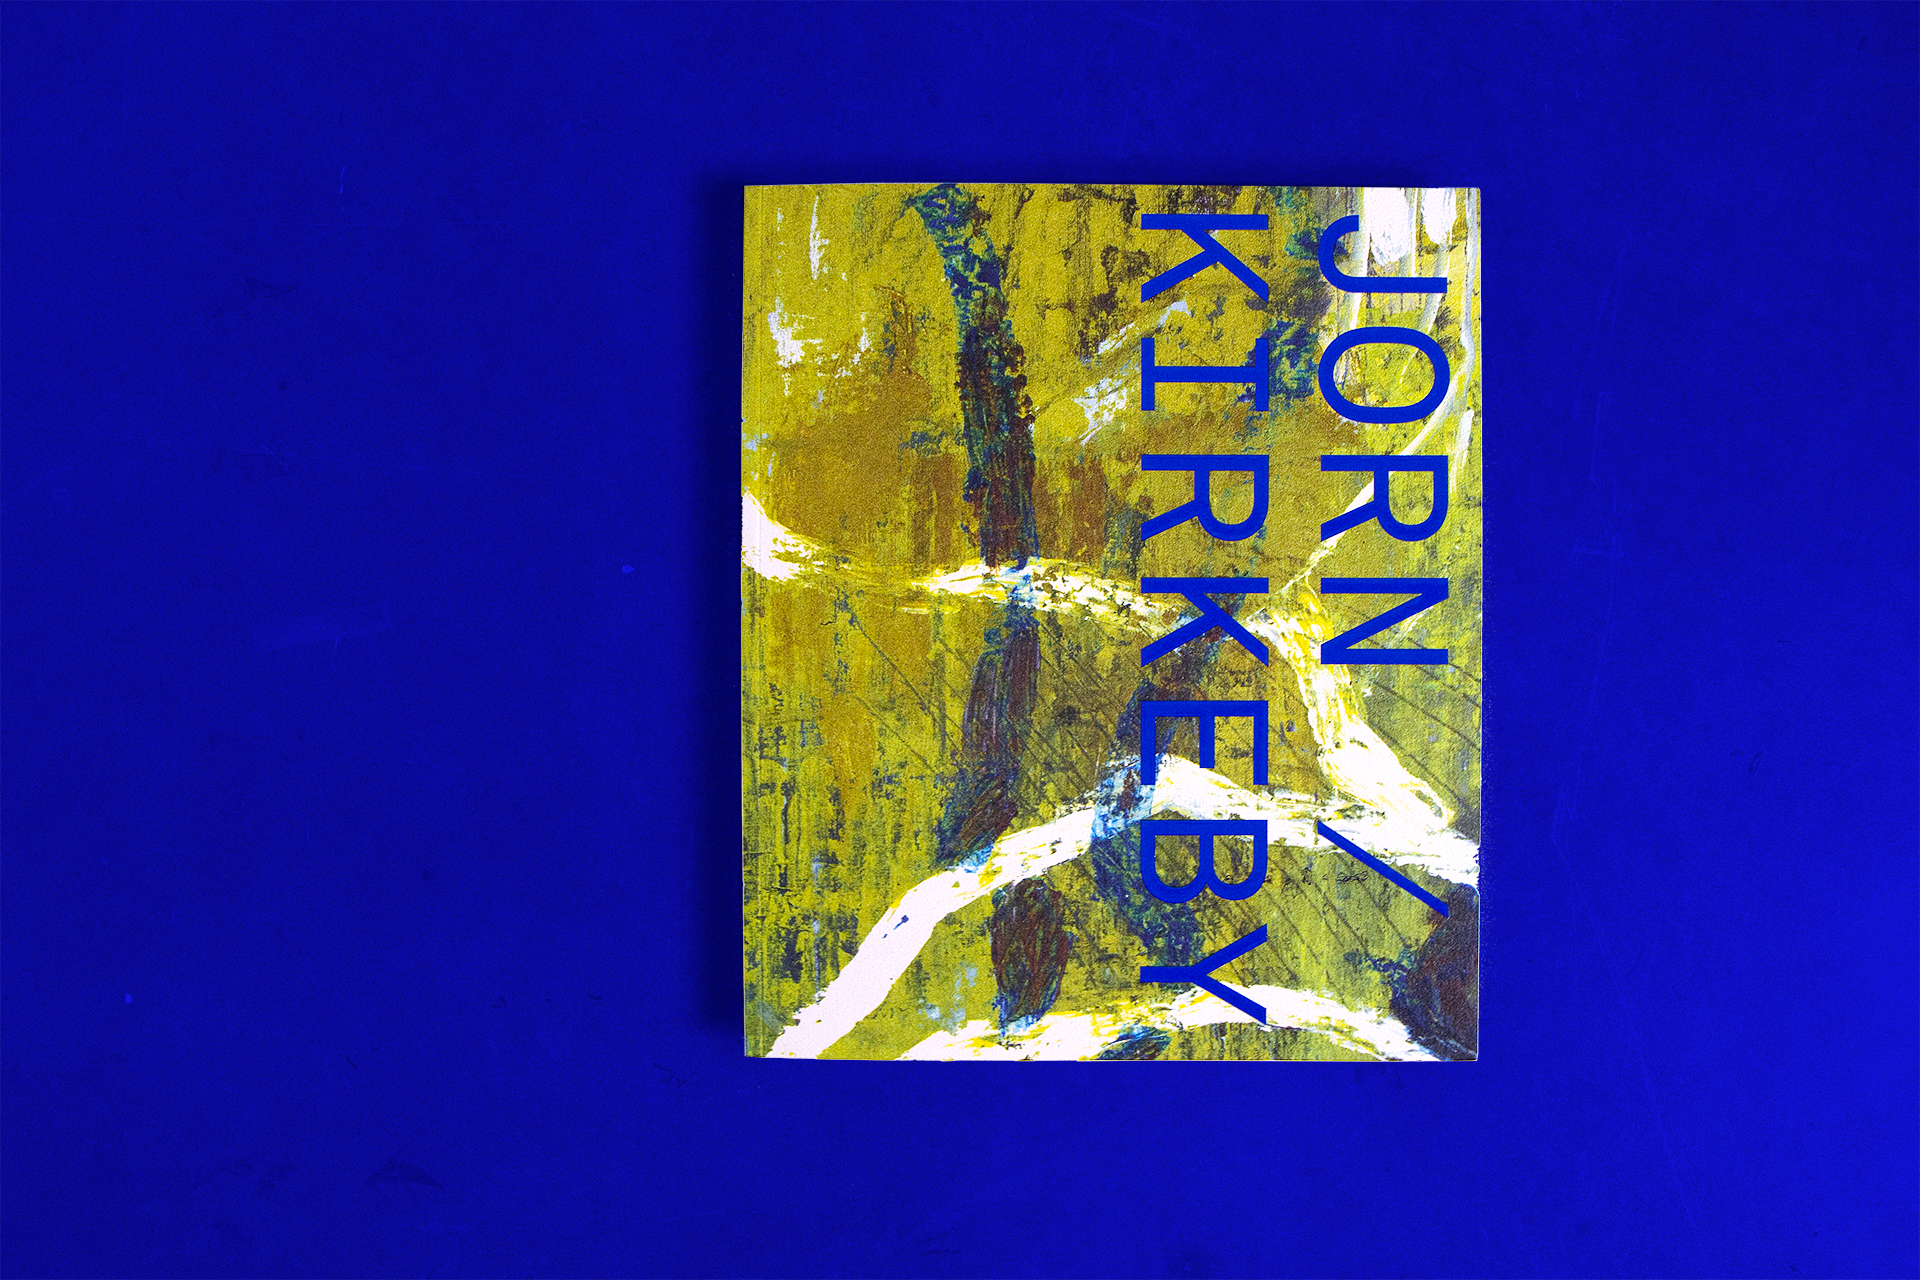 aros-jorn-kirkeby-book-cover-02-ian-bennett